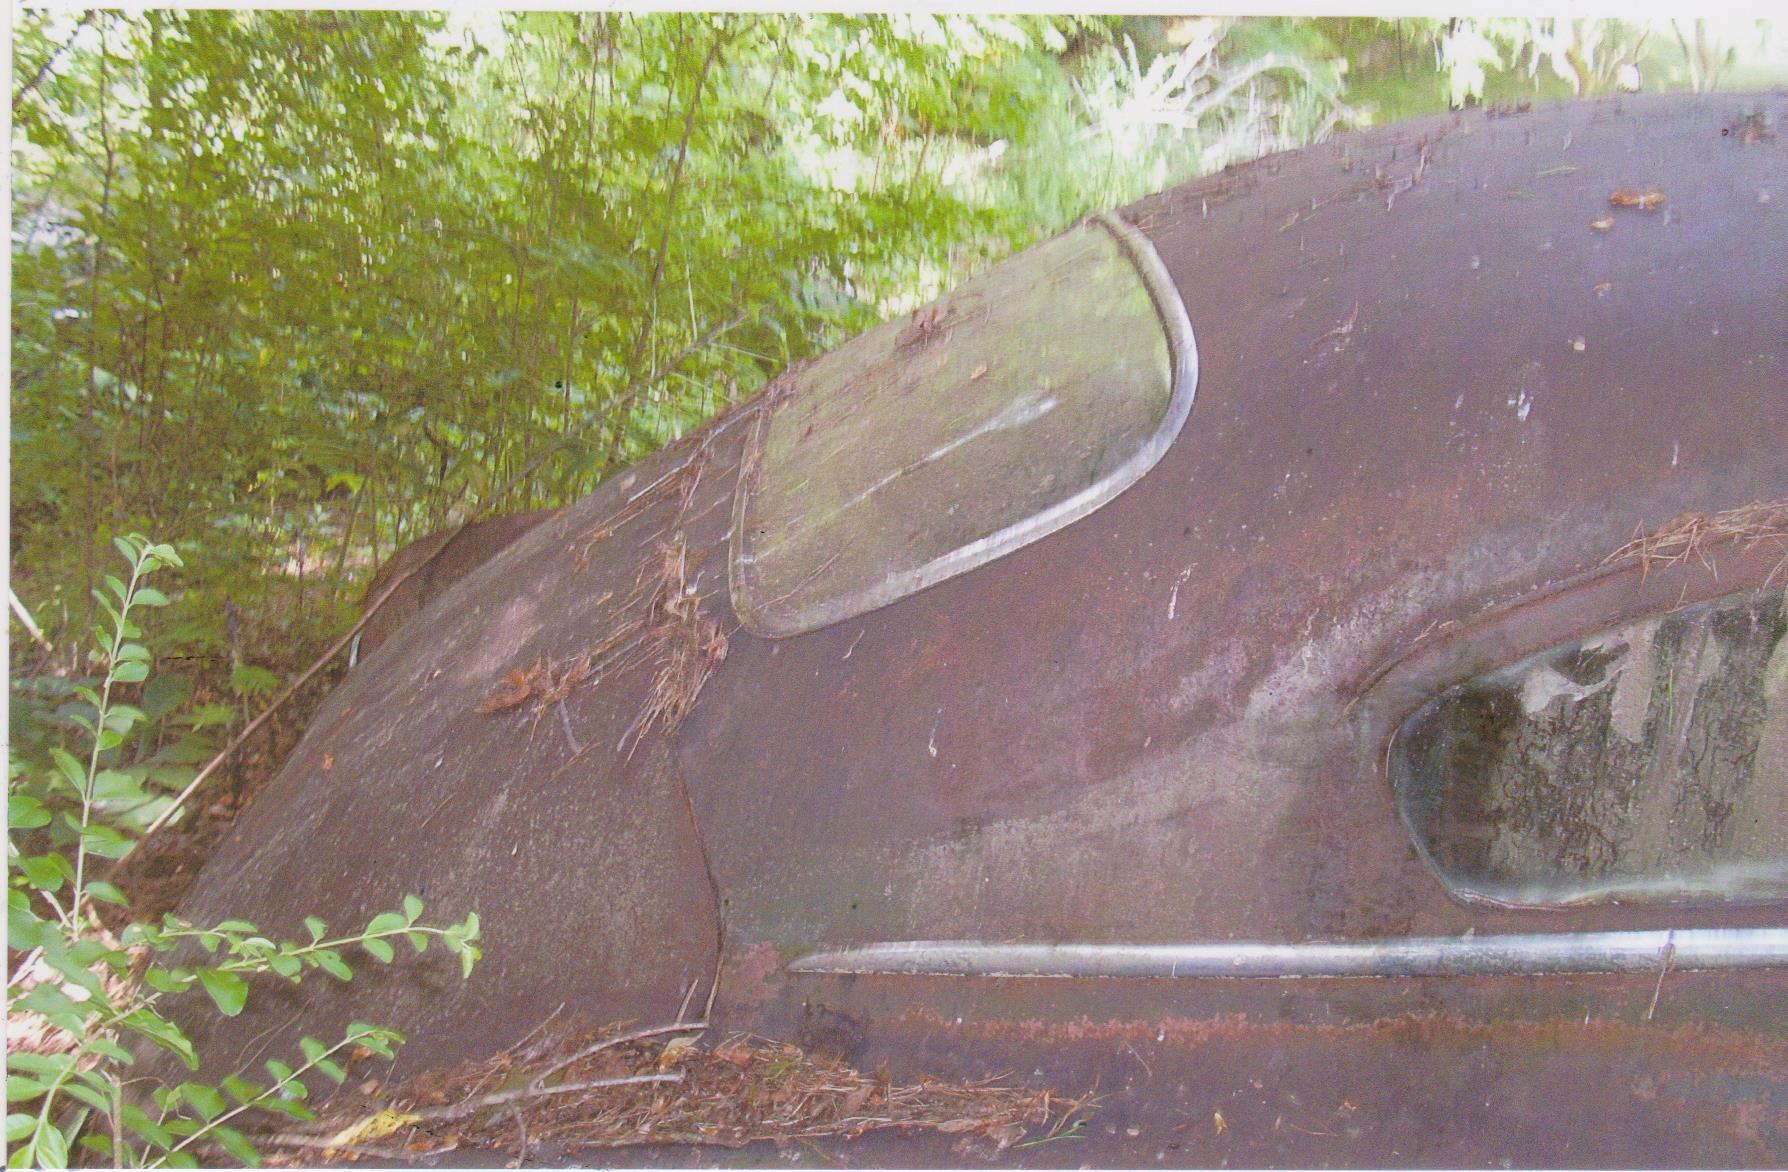 Click image for larger version  Name:Pontiac Silver Streak 003.jpg Views:71 Size:350.6 KB ID:75816